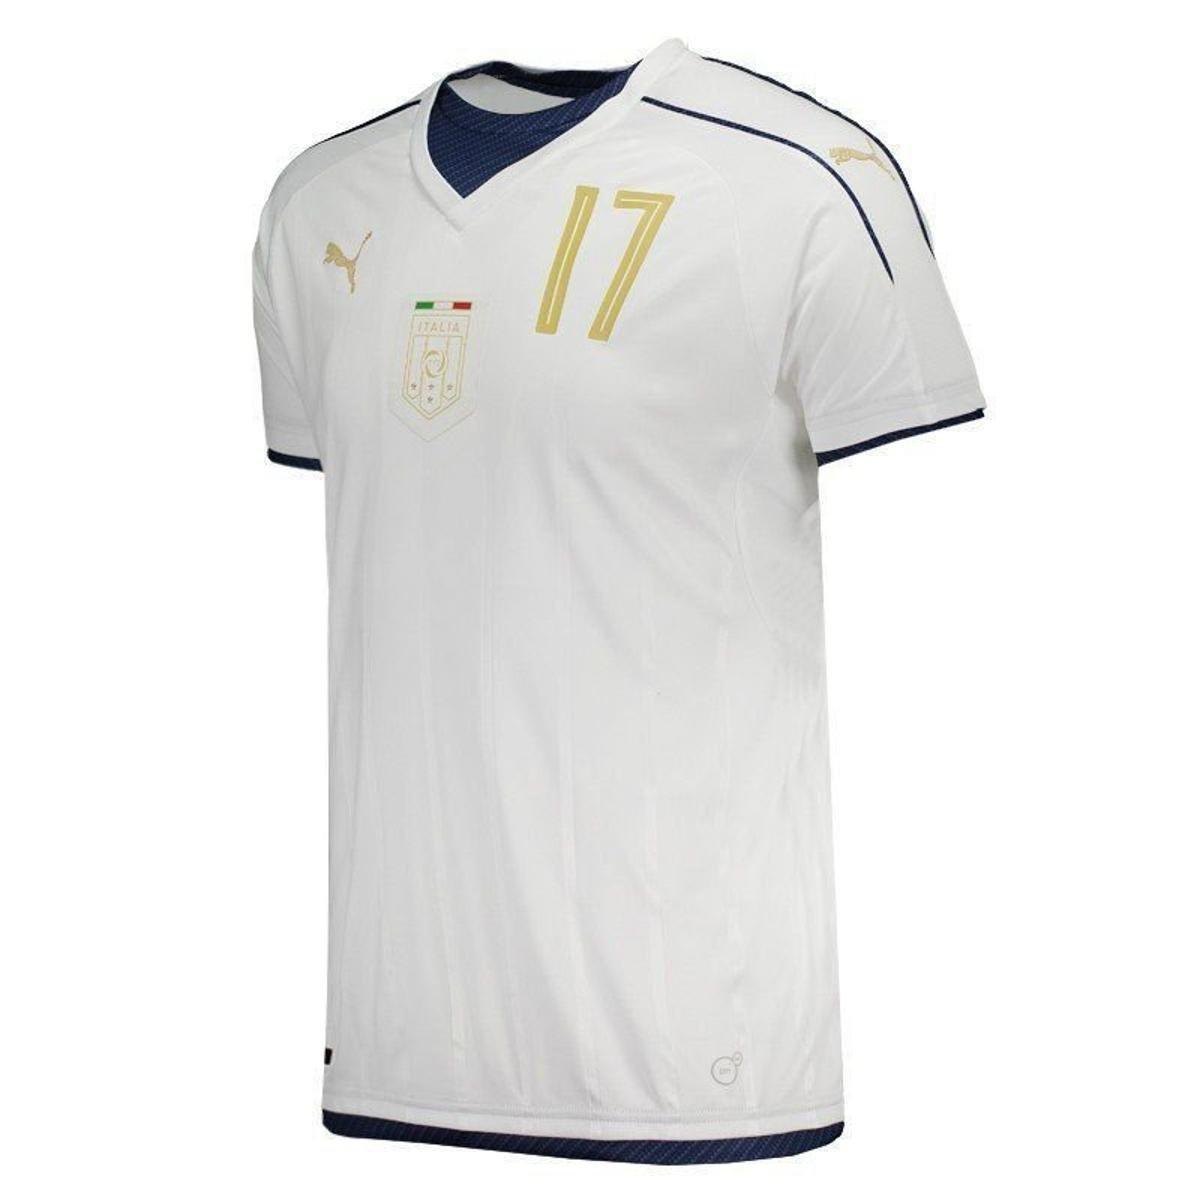 6432a5447b Camisa Puma Itália Away 2017 Tributo N°17 Eder Masculina - Branco ...